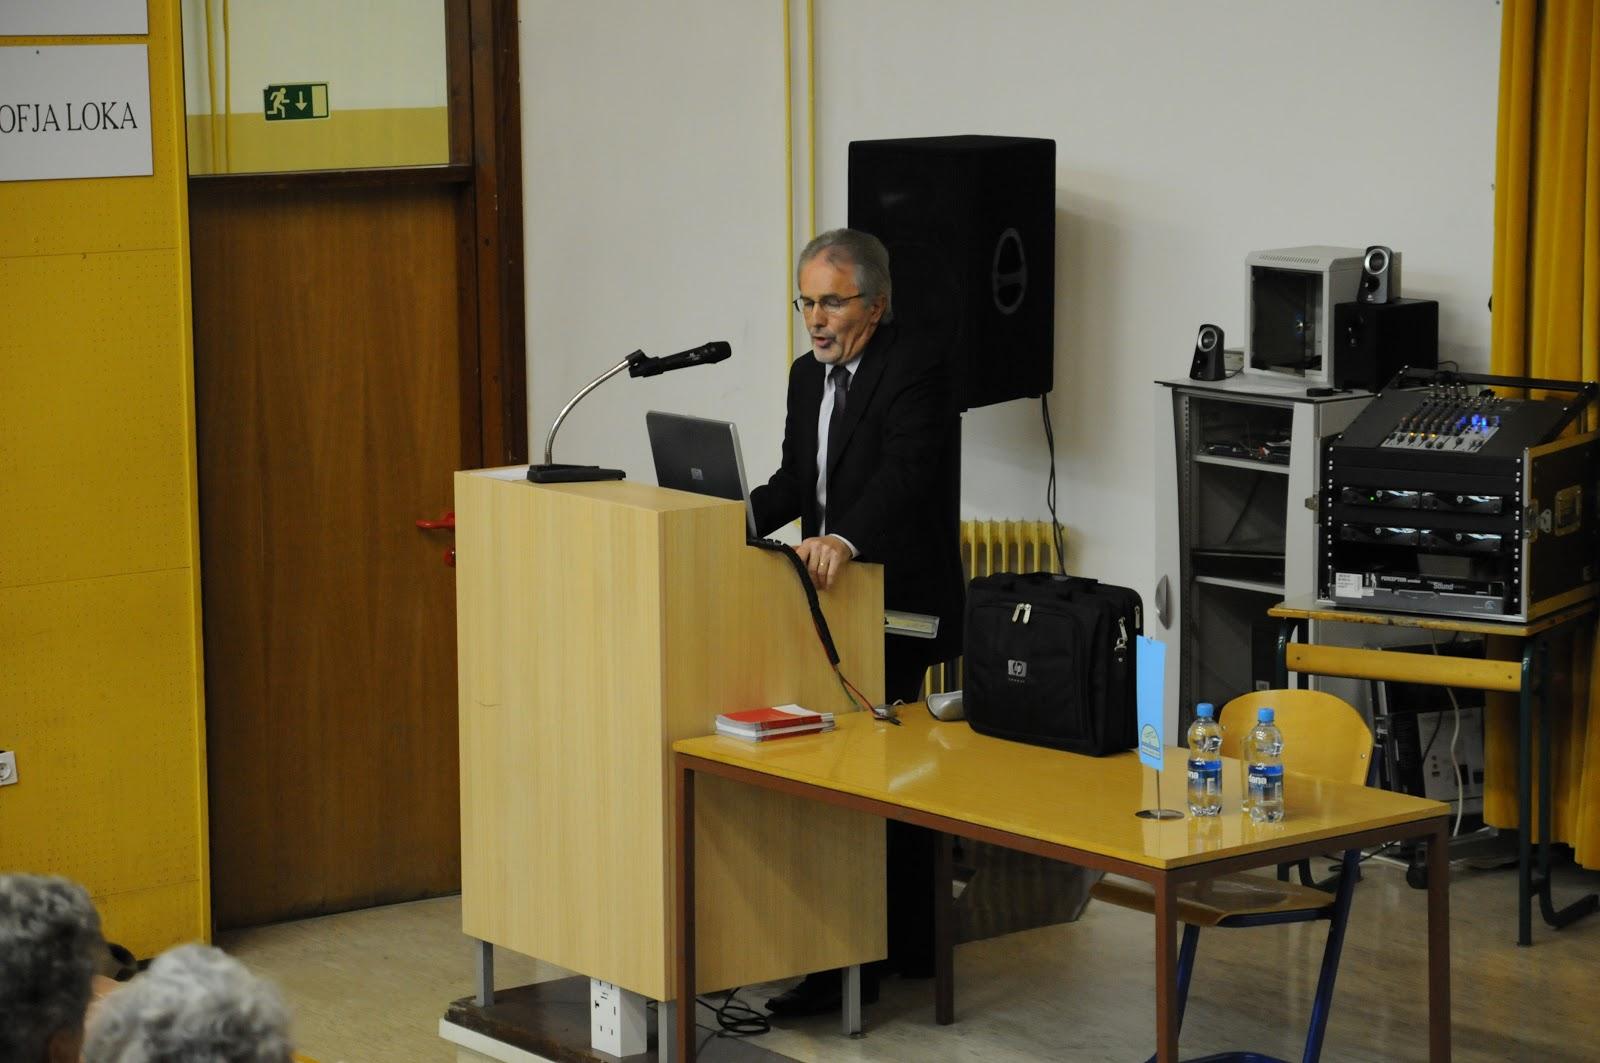 Predavanje, dr. Camlek - oktober 2011 - DSC_3863.JPG